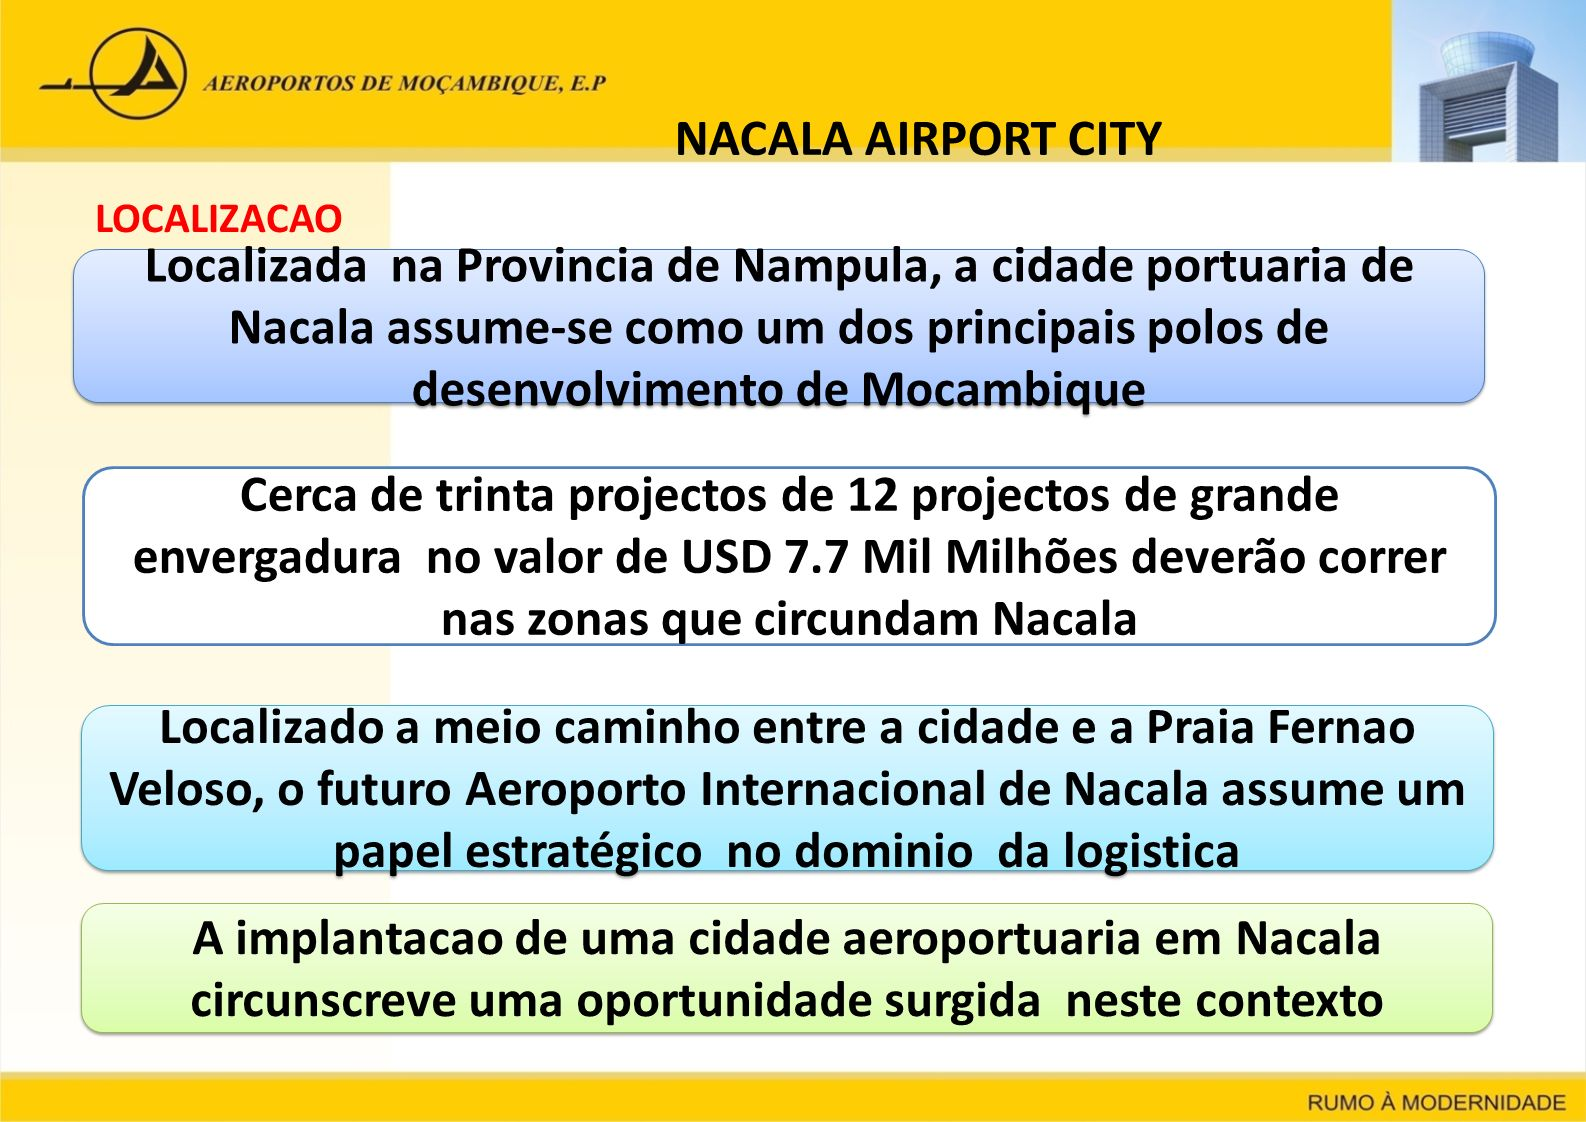 NACALA AIRPORT CITY LOCALIZACAO.